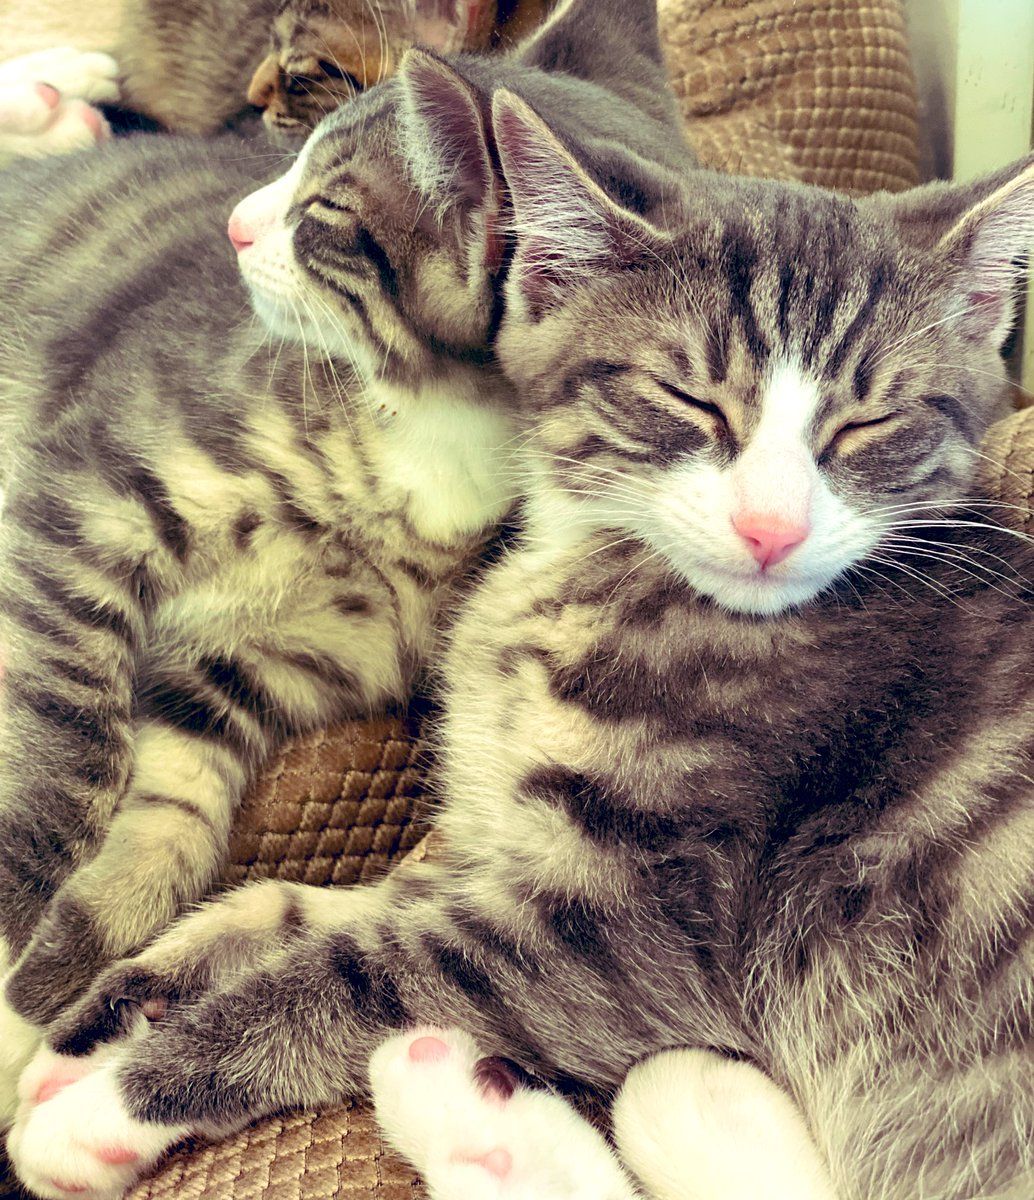 Mornin #DoubleTrouble   #Fosterkittens #cute #cats #CatsOfTwitter #kittens #kittensoftwitter #catsofinstagram #meow